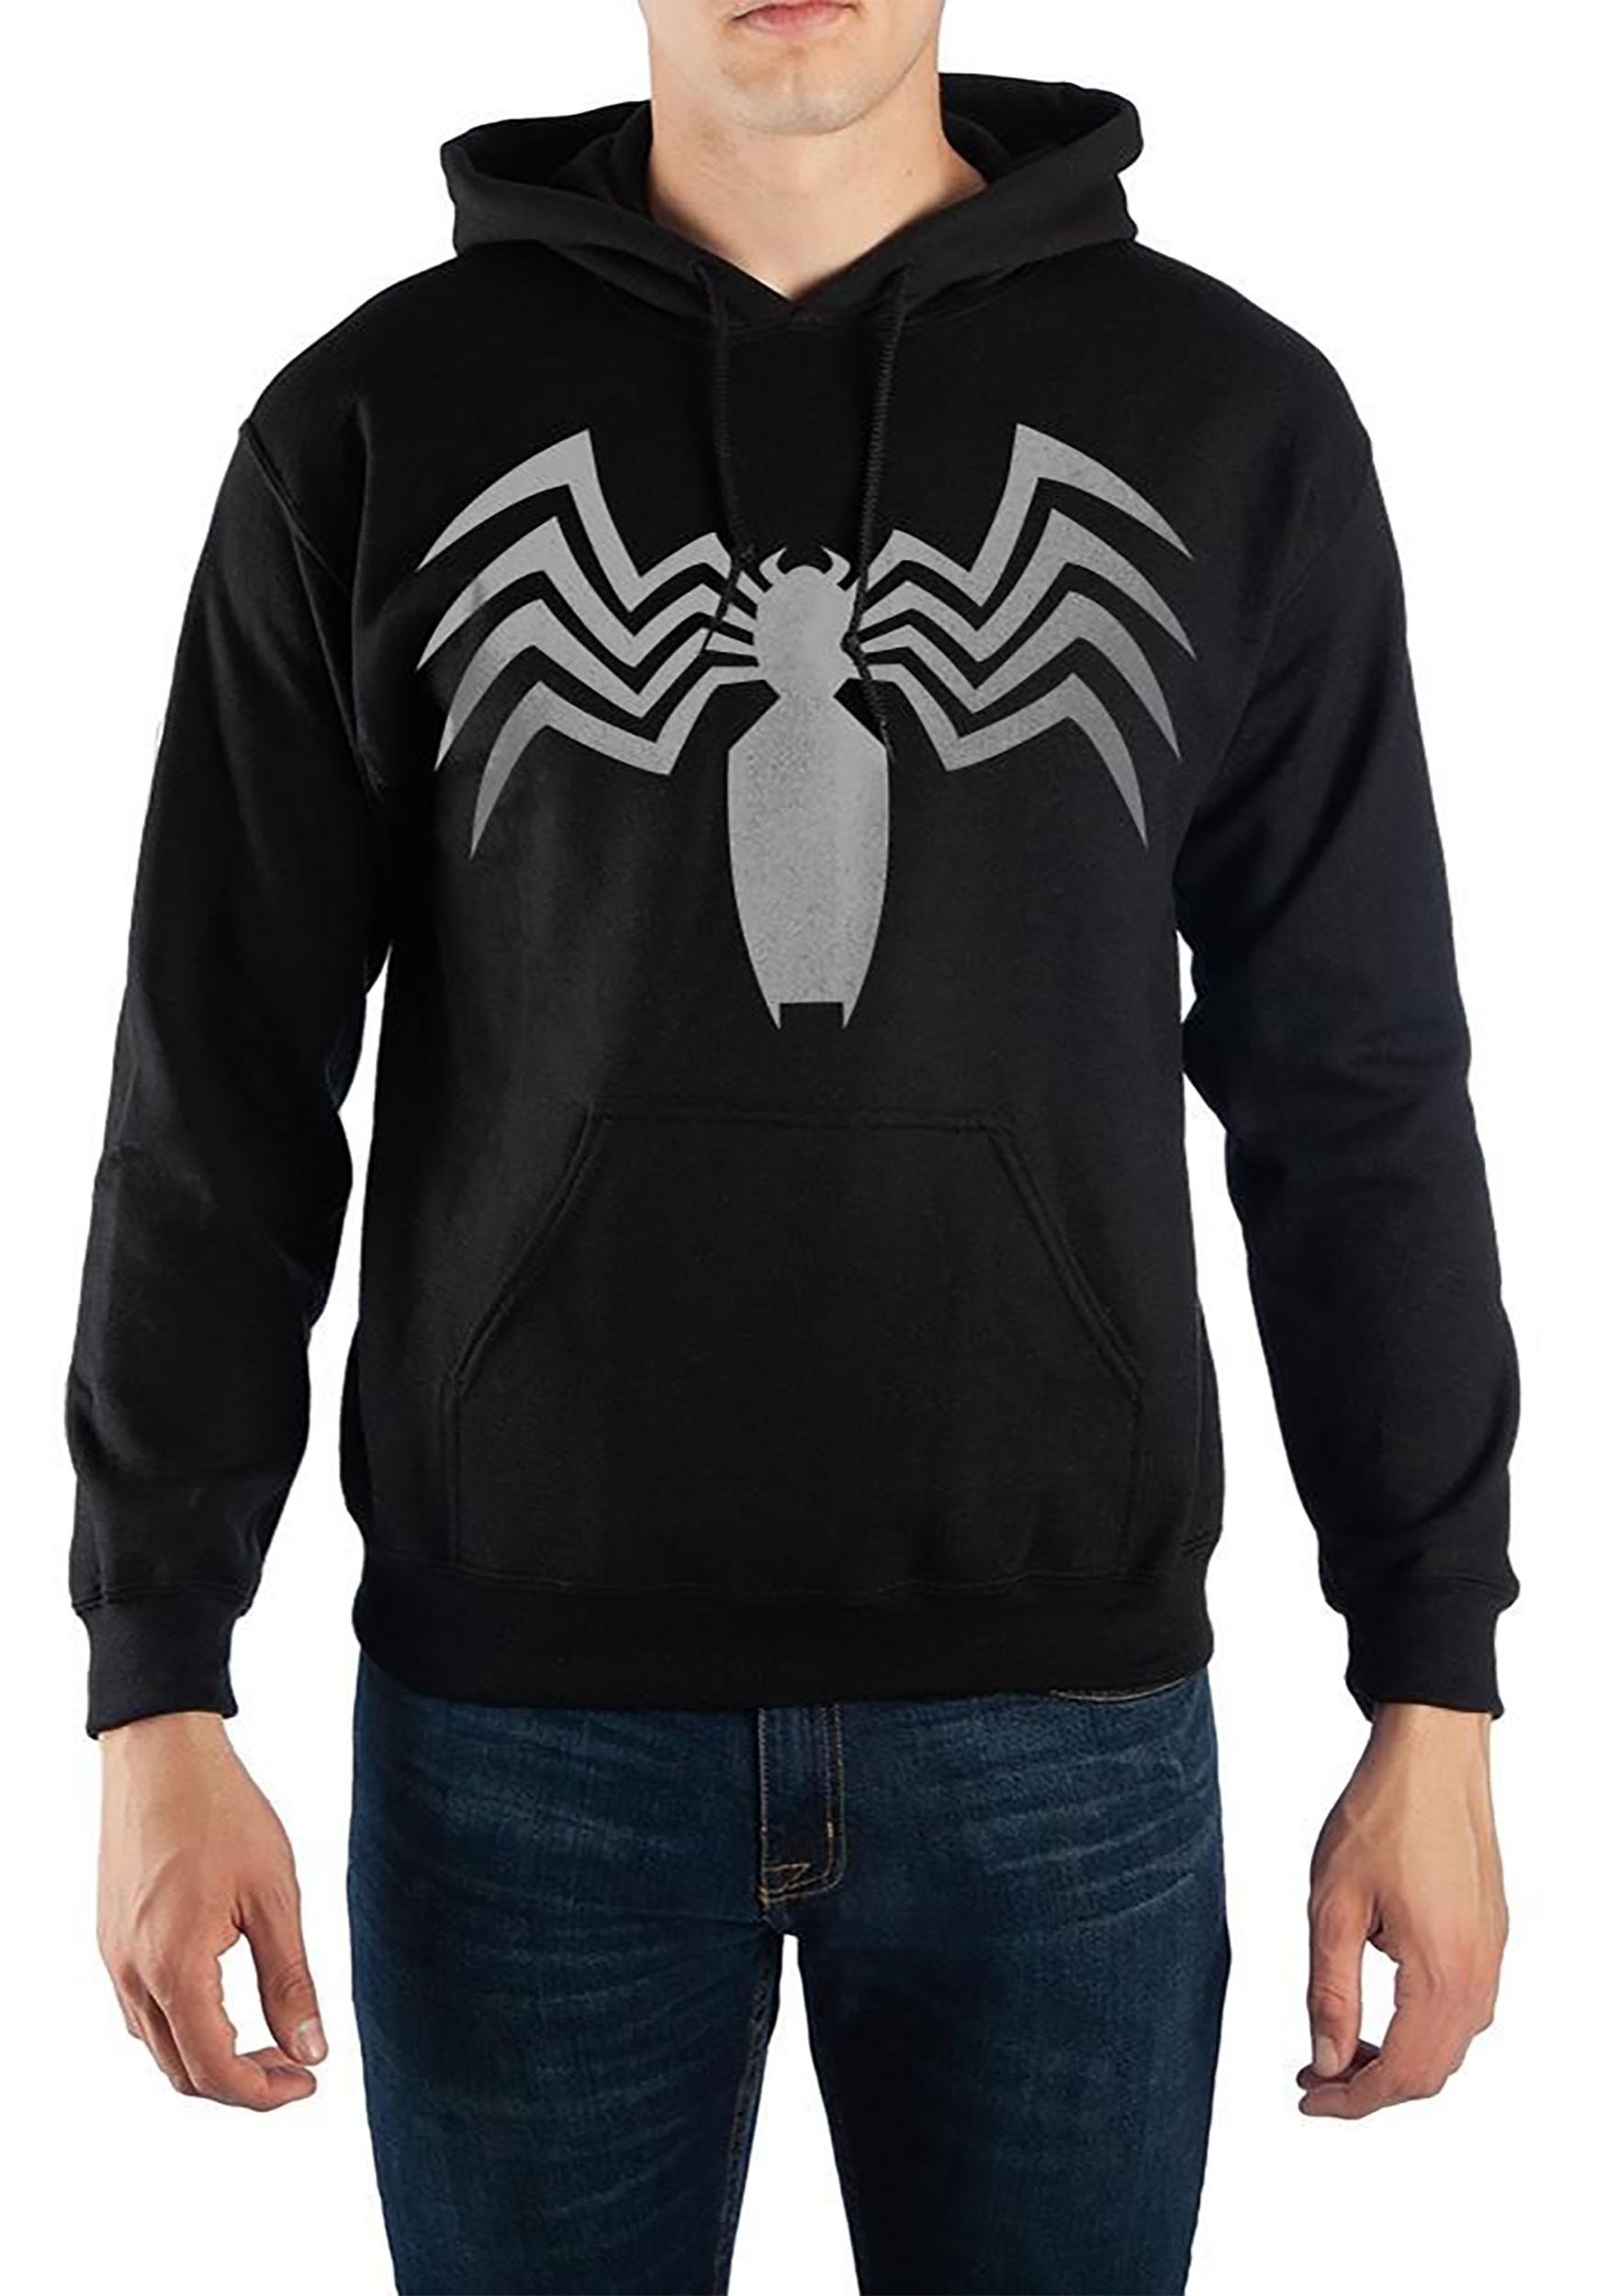 Venom Icon Hoodie for Men